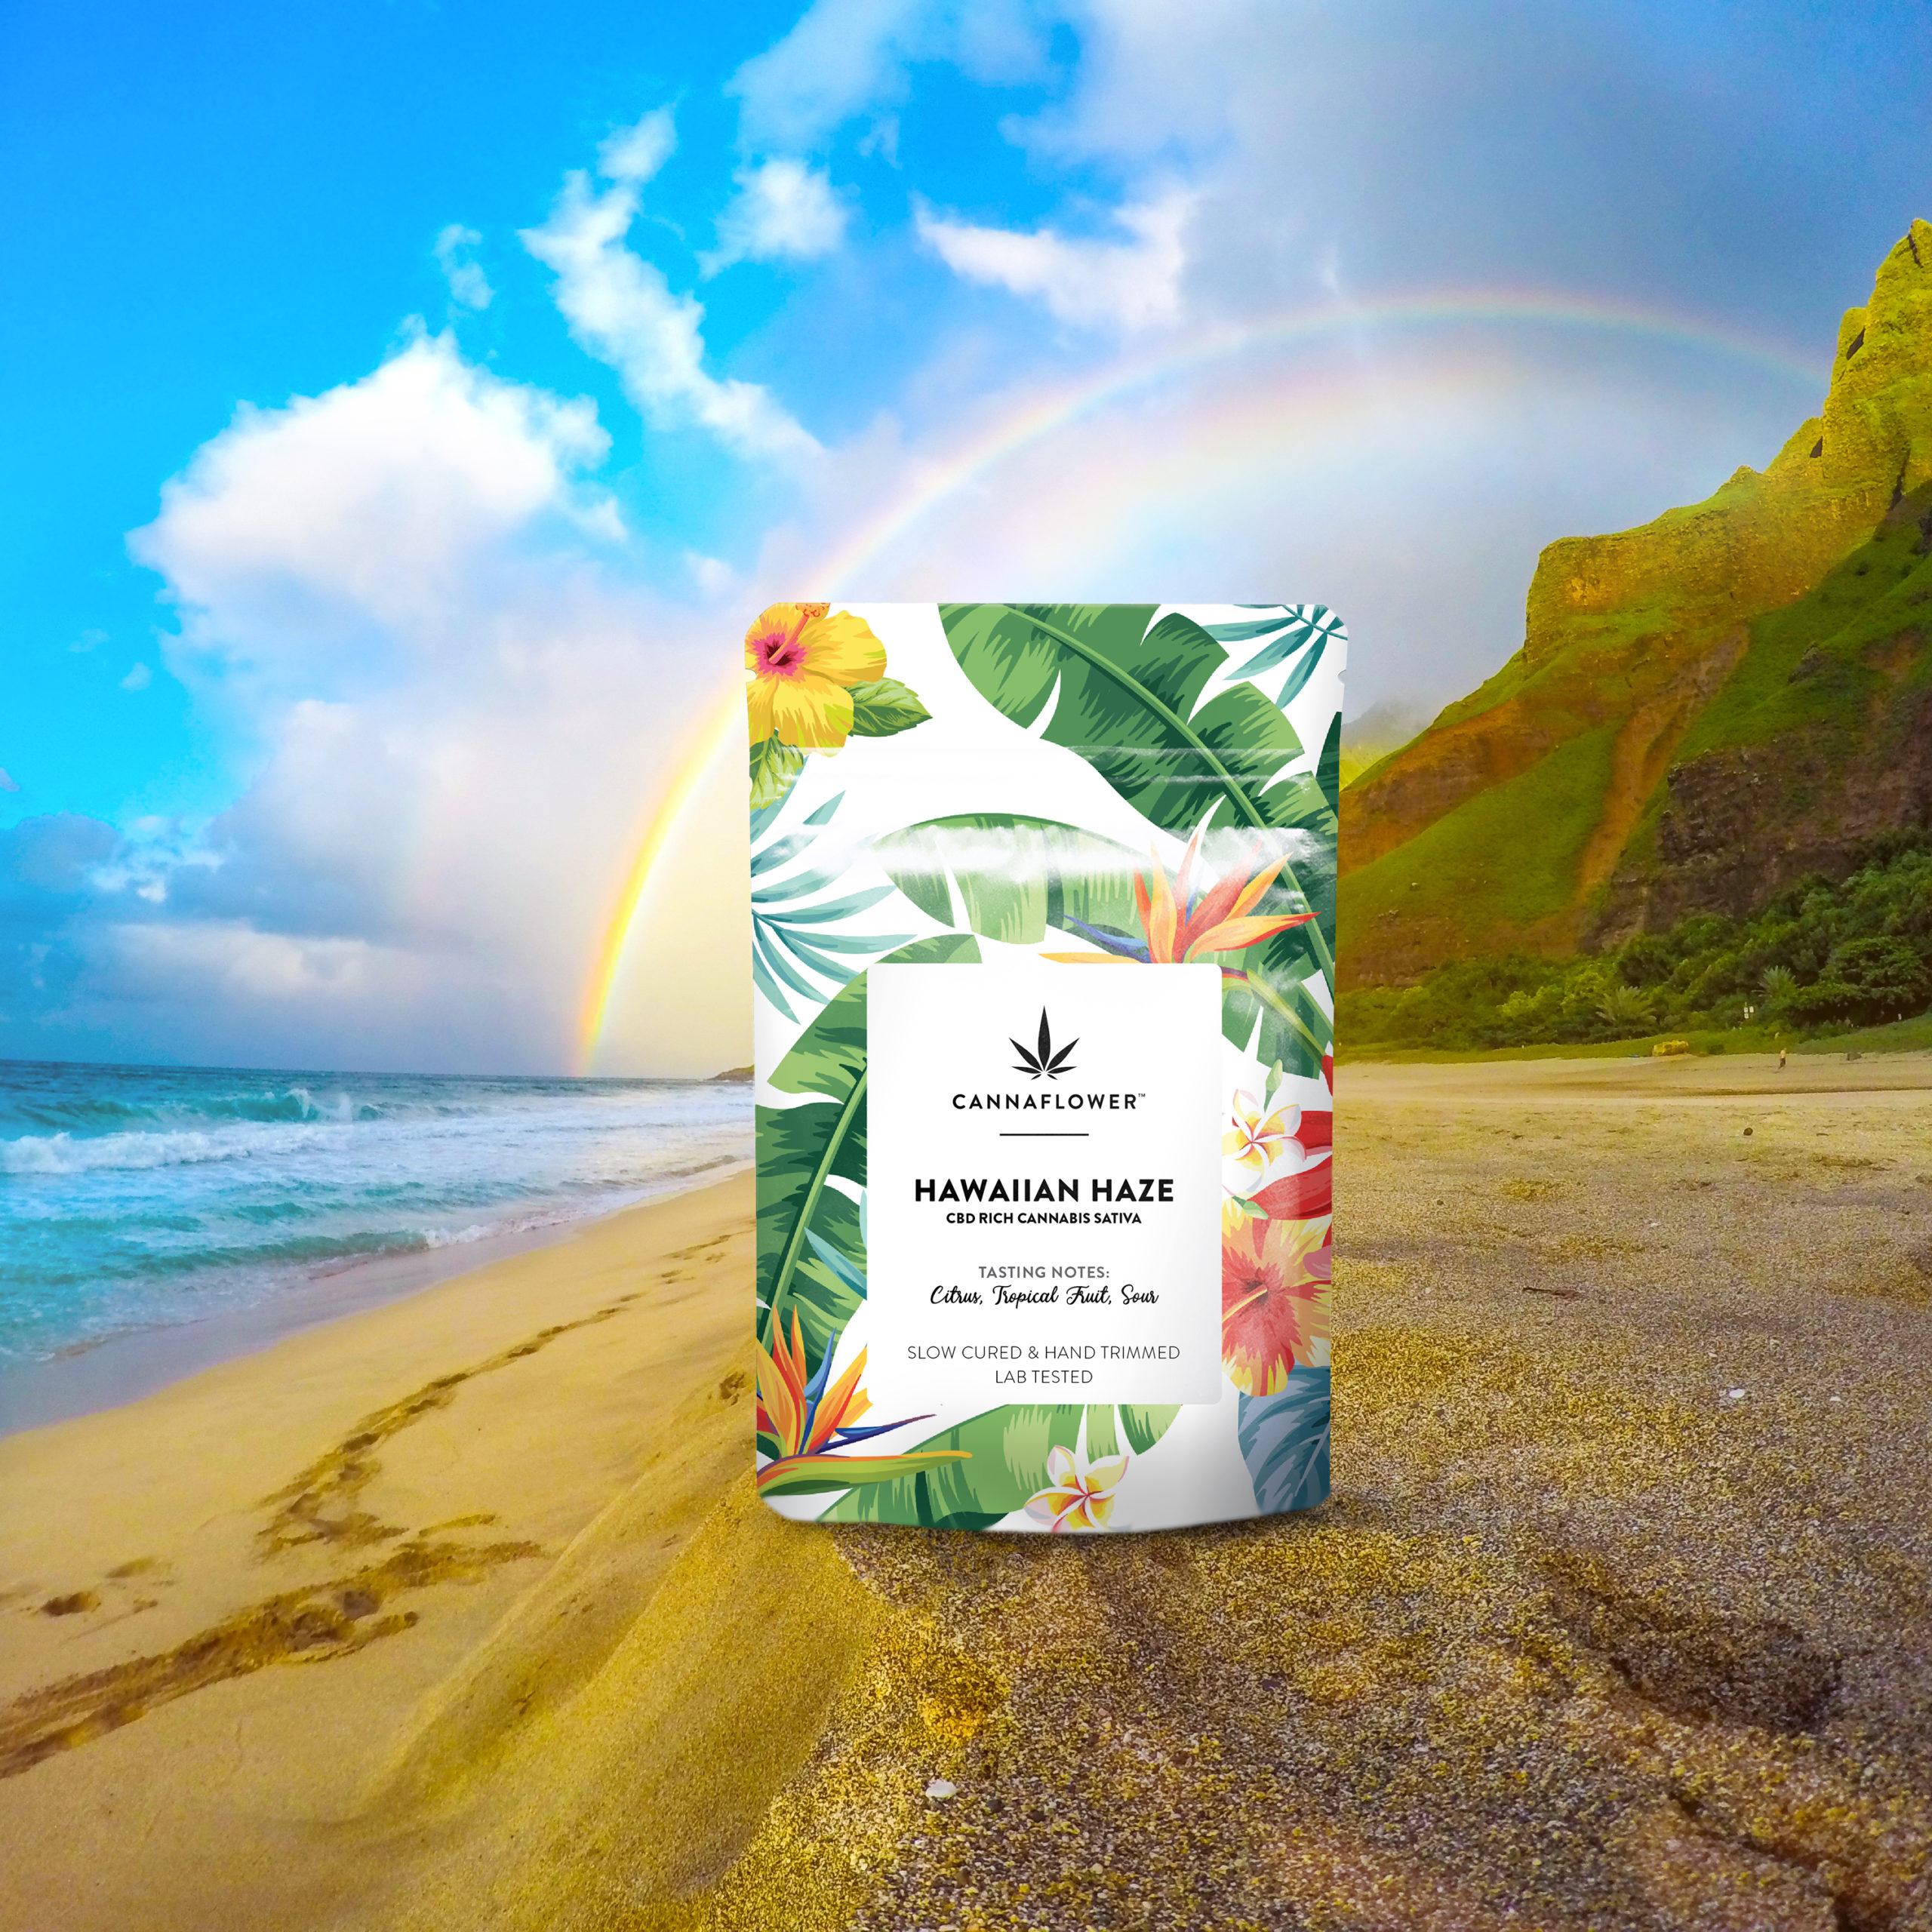 Cannaflower Hawaiian Haze Lifestyle